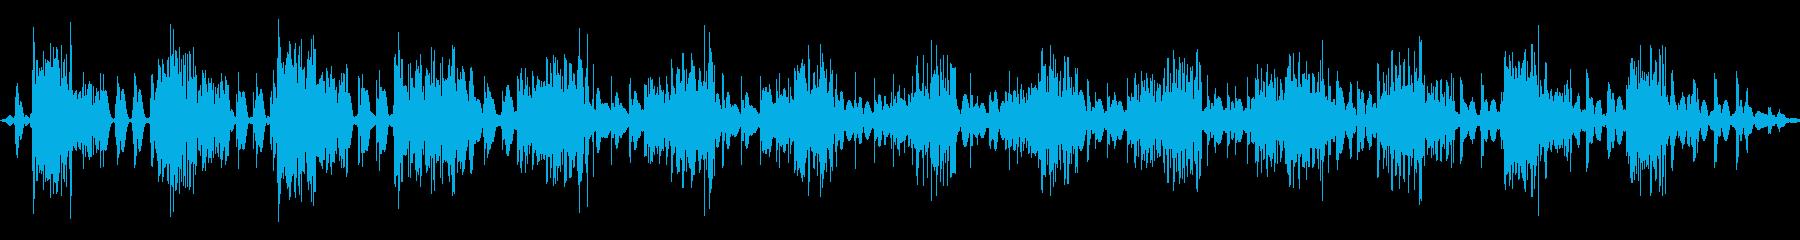 SciFi EC01_83_4の再生済みの波形